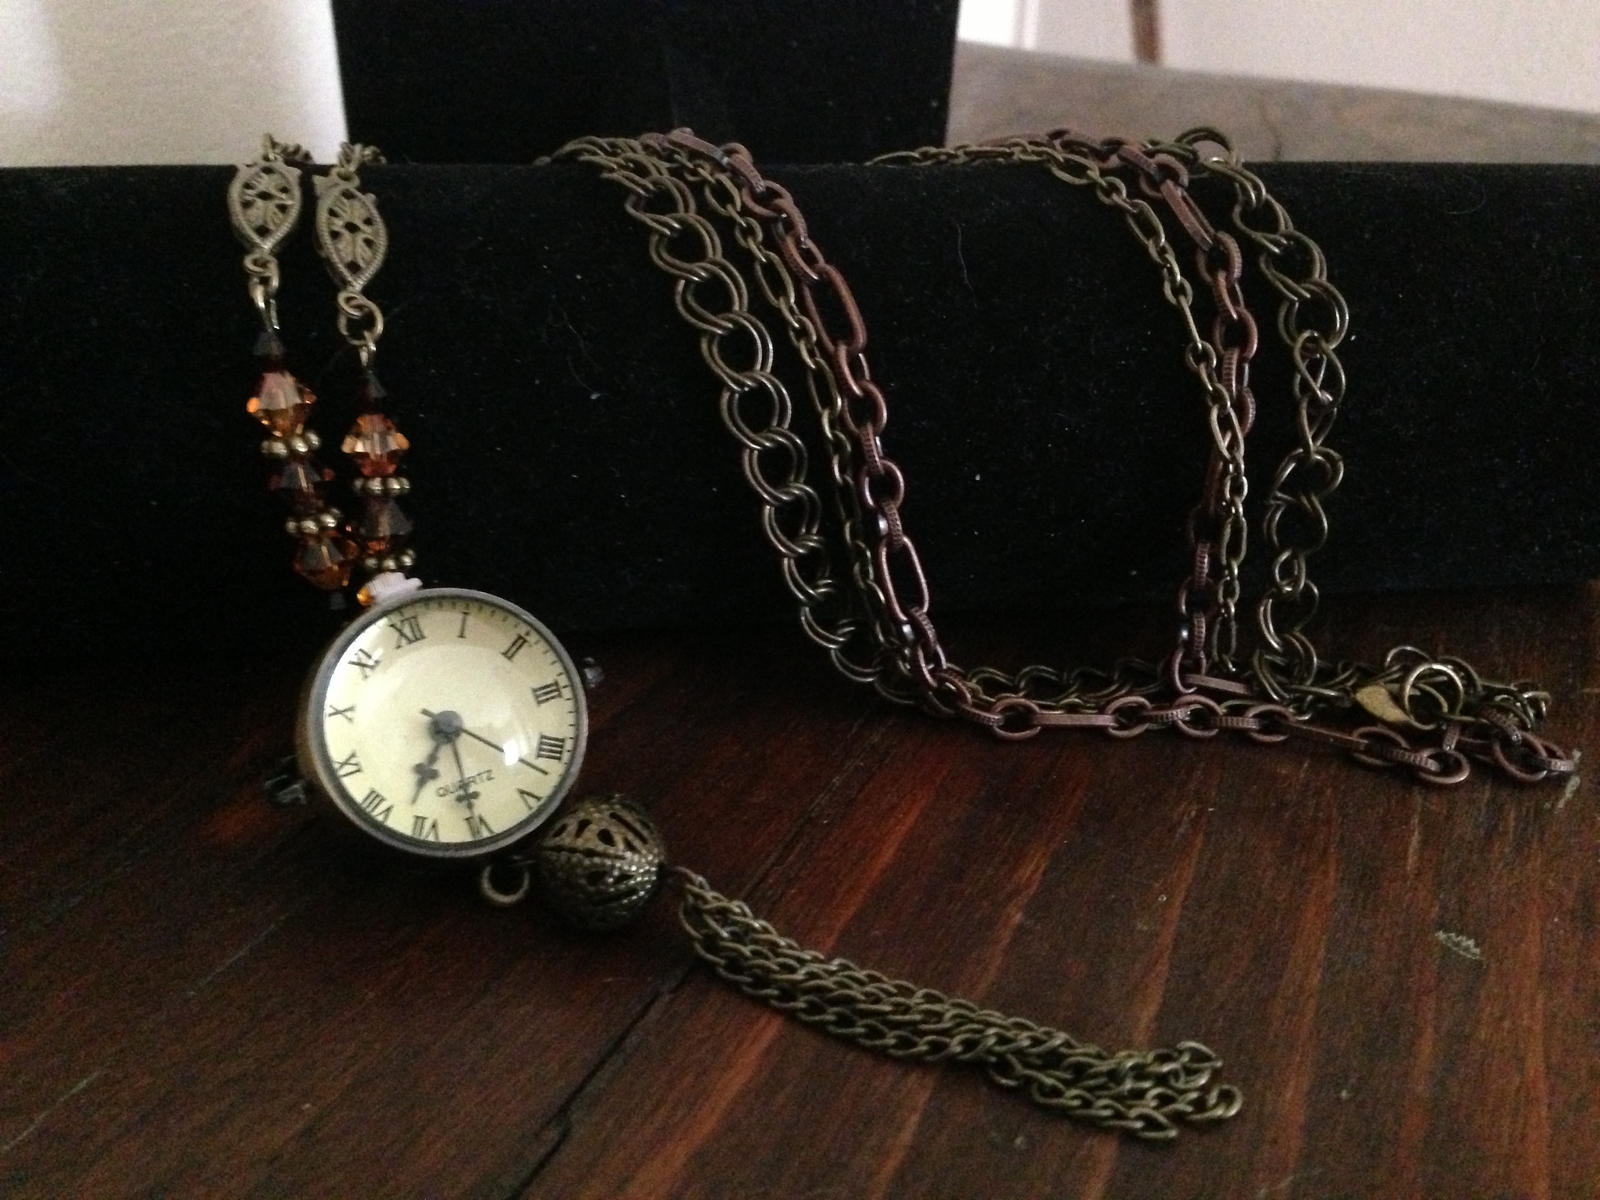 Time Traveler by NikidaEve